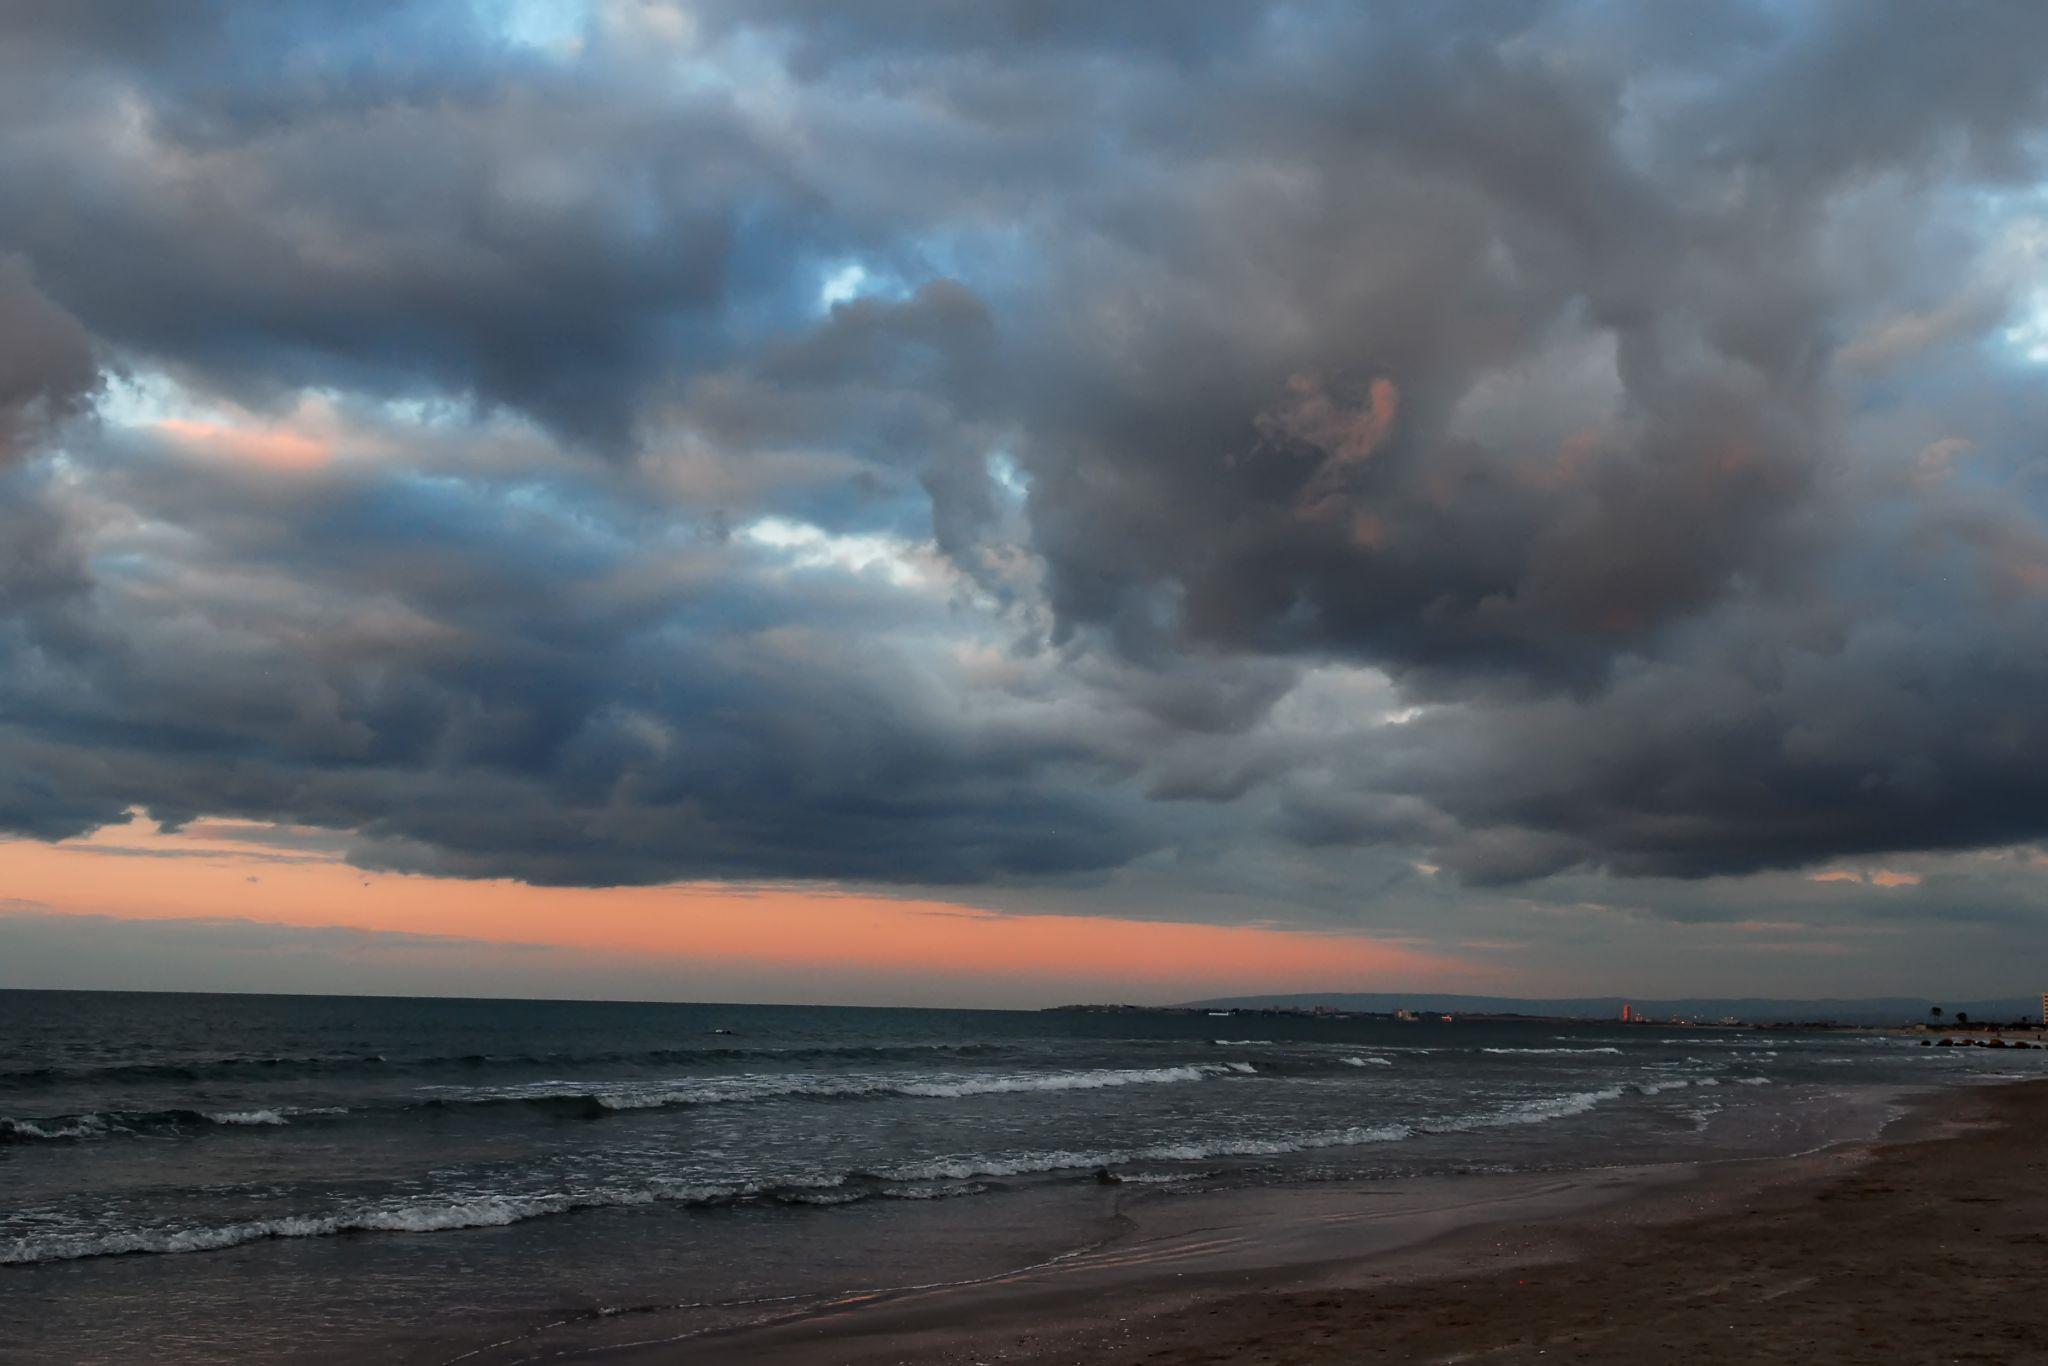 Winter evening in the Bay of Haifa (Kiryat Haim), Israel